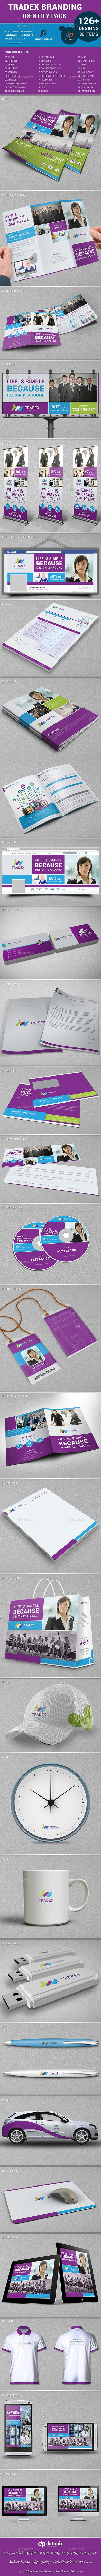 Tradex Branding Identity Pack - Stationery Print Templates